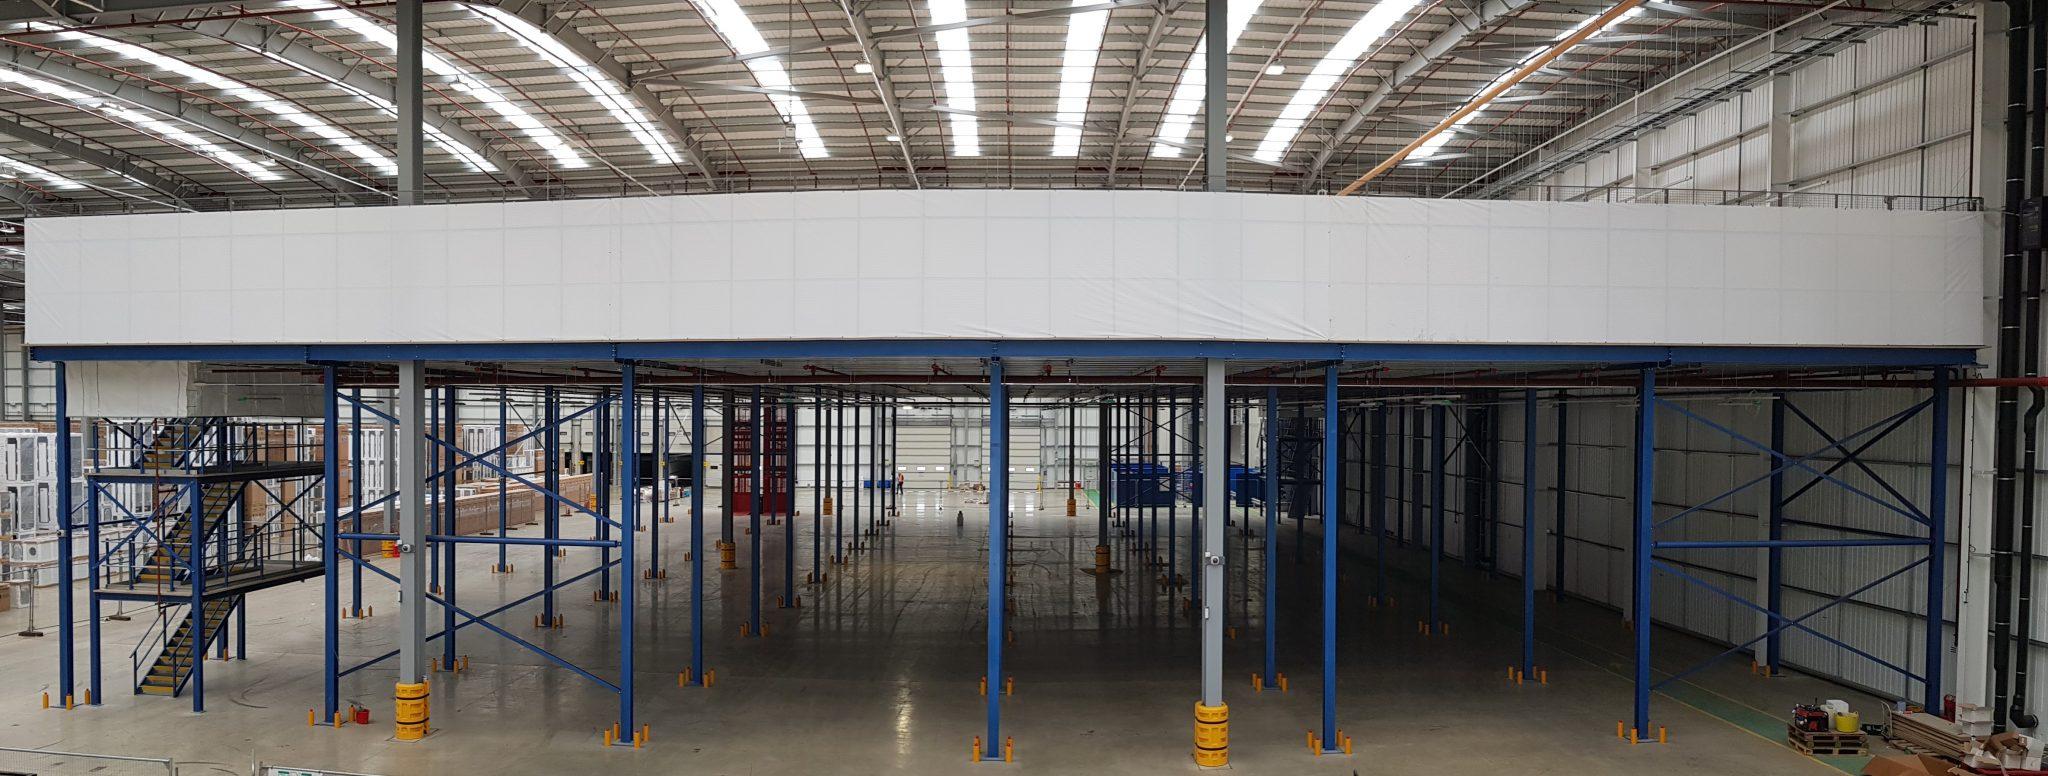 8 Game-changing benefits of retail mezzanine floors